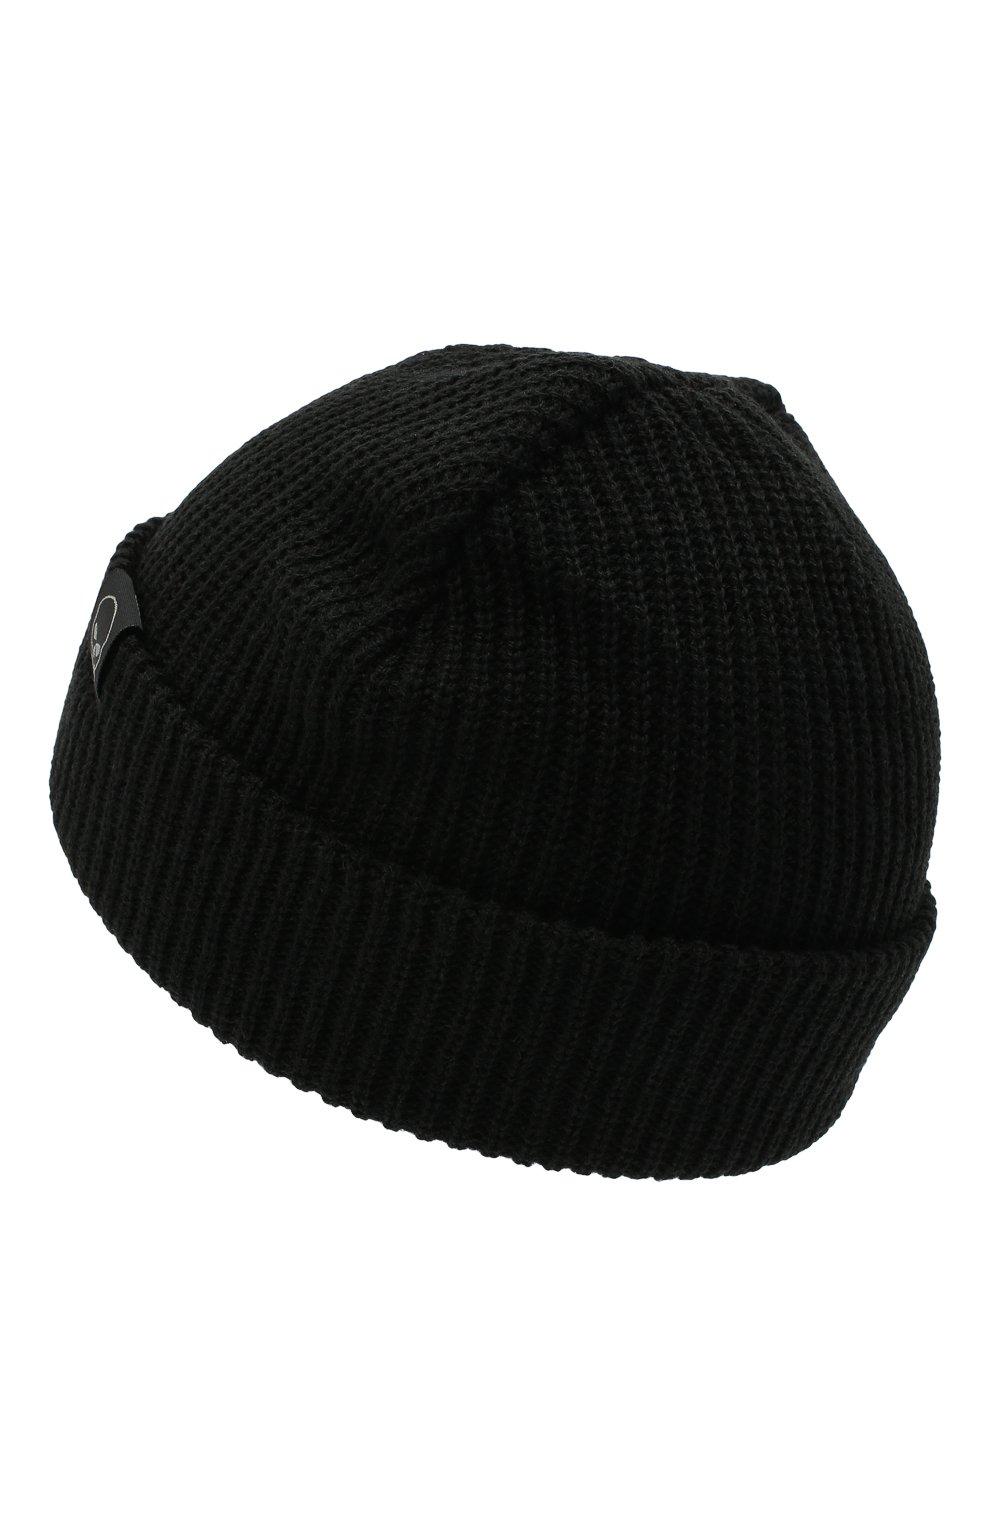 Мужская шапка HARLEY-DAVIDSON черного цвета, арт. 97601-21VM | Фото 2 (Материал: Текстиль, Синтетический материал; Кросс-КТ: Трикотаж)